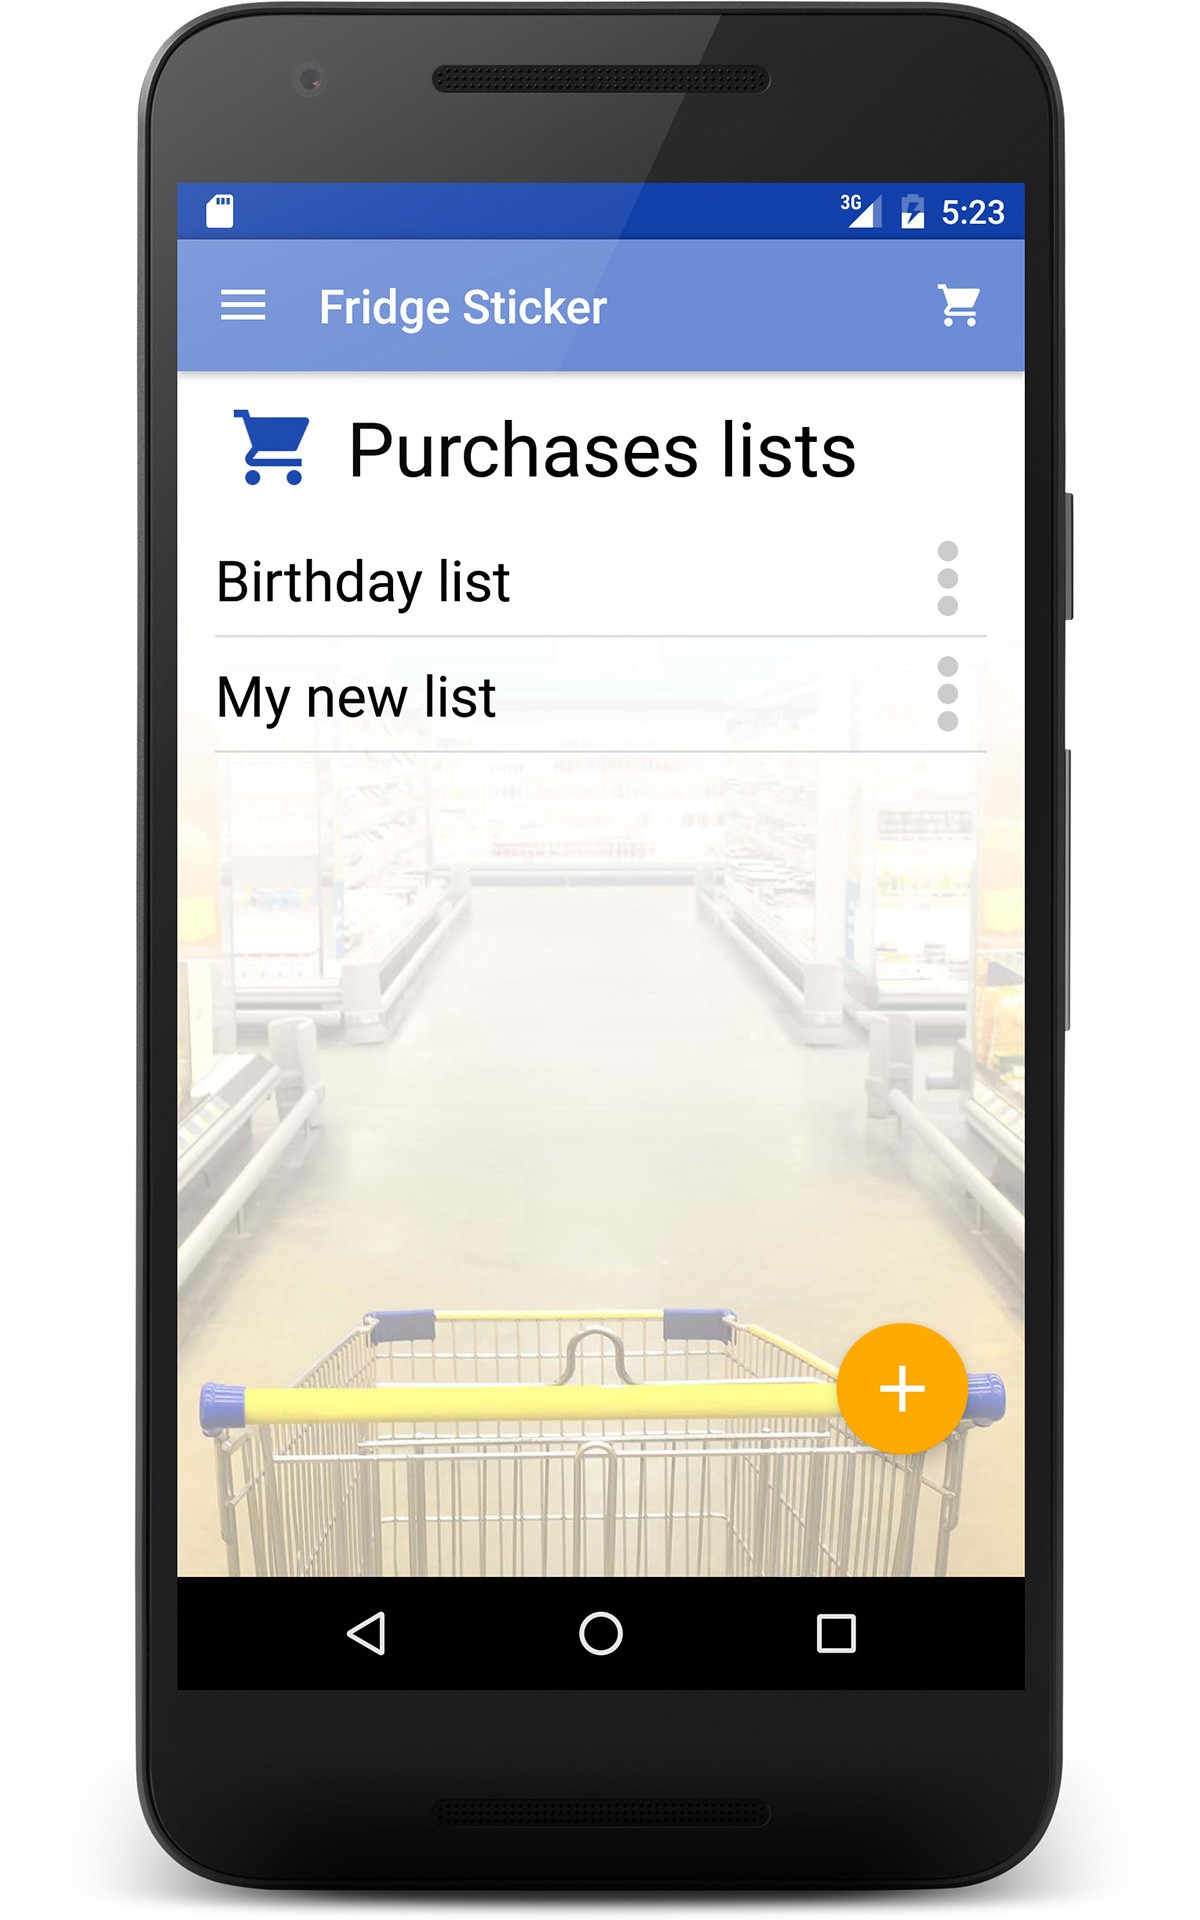 Shopping List - Fridge Sticker